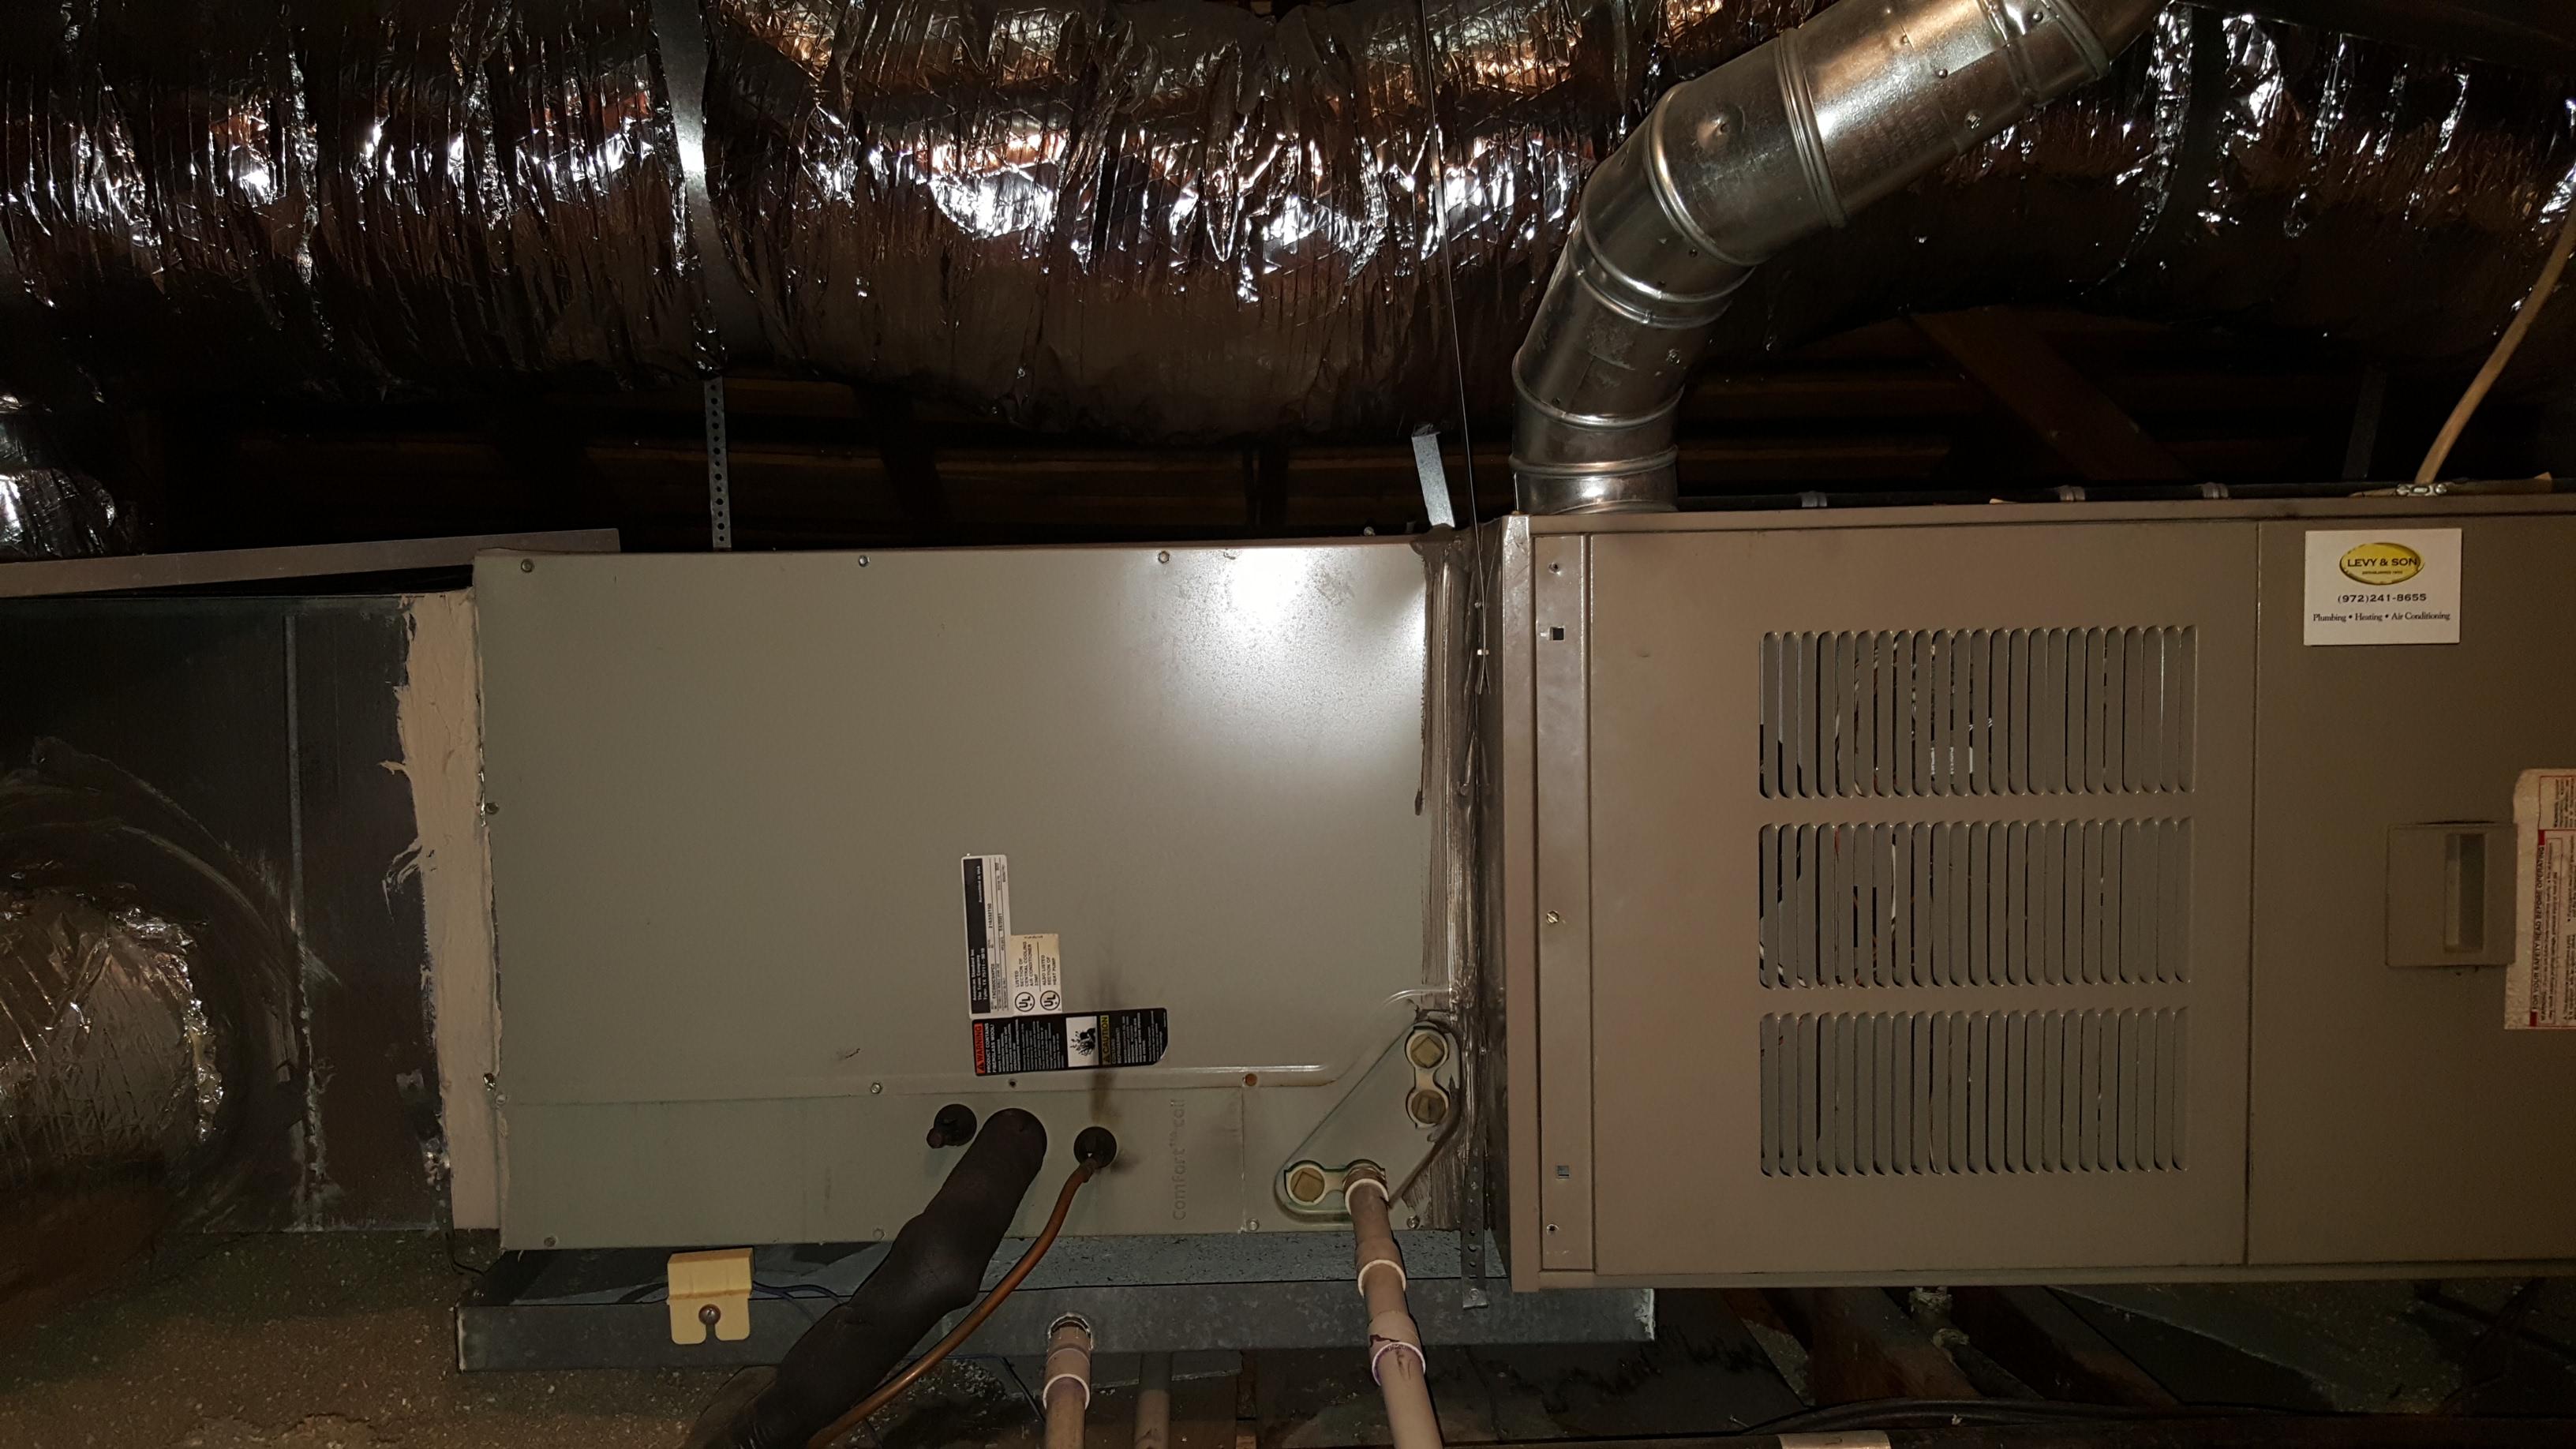 Trane furnace and e. coil